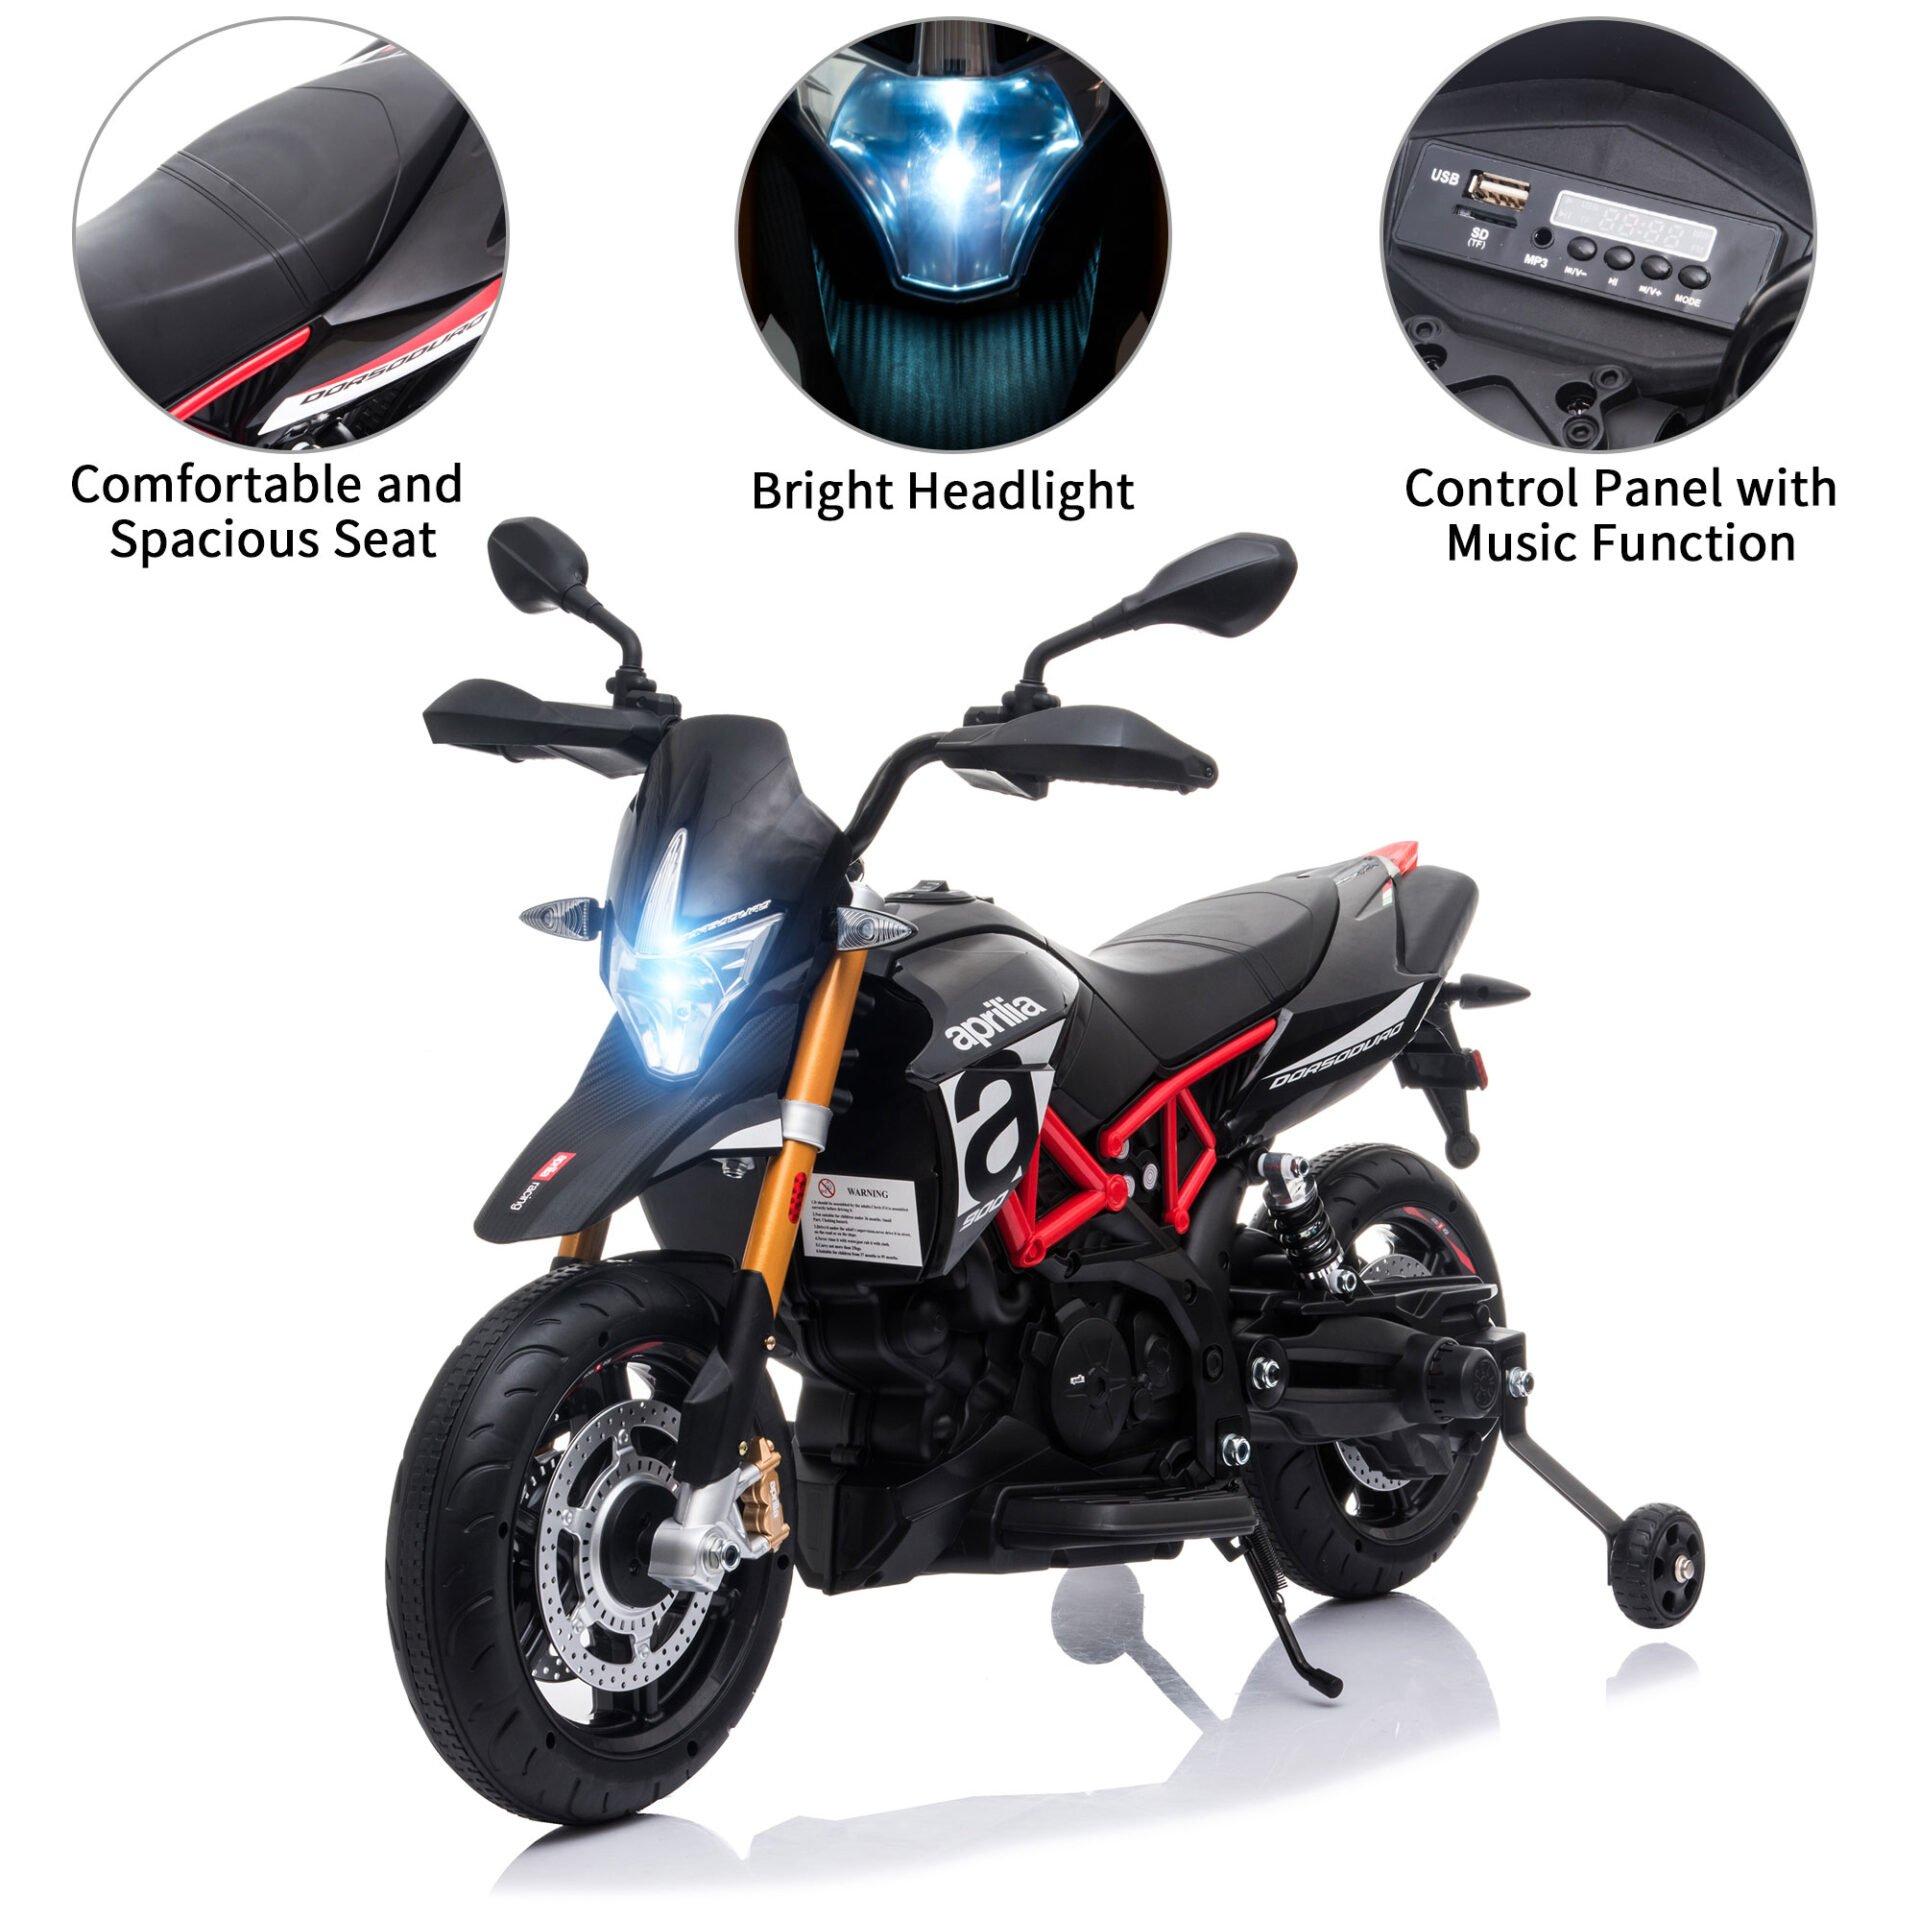 Aprilia Licensed 12V Kids Toy Motorcycle, Black TH17Y0660 zt1